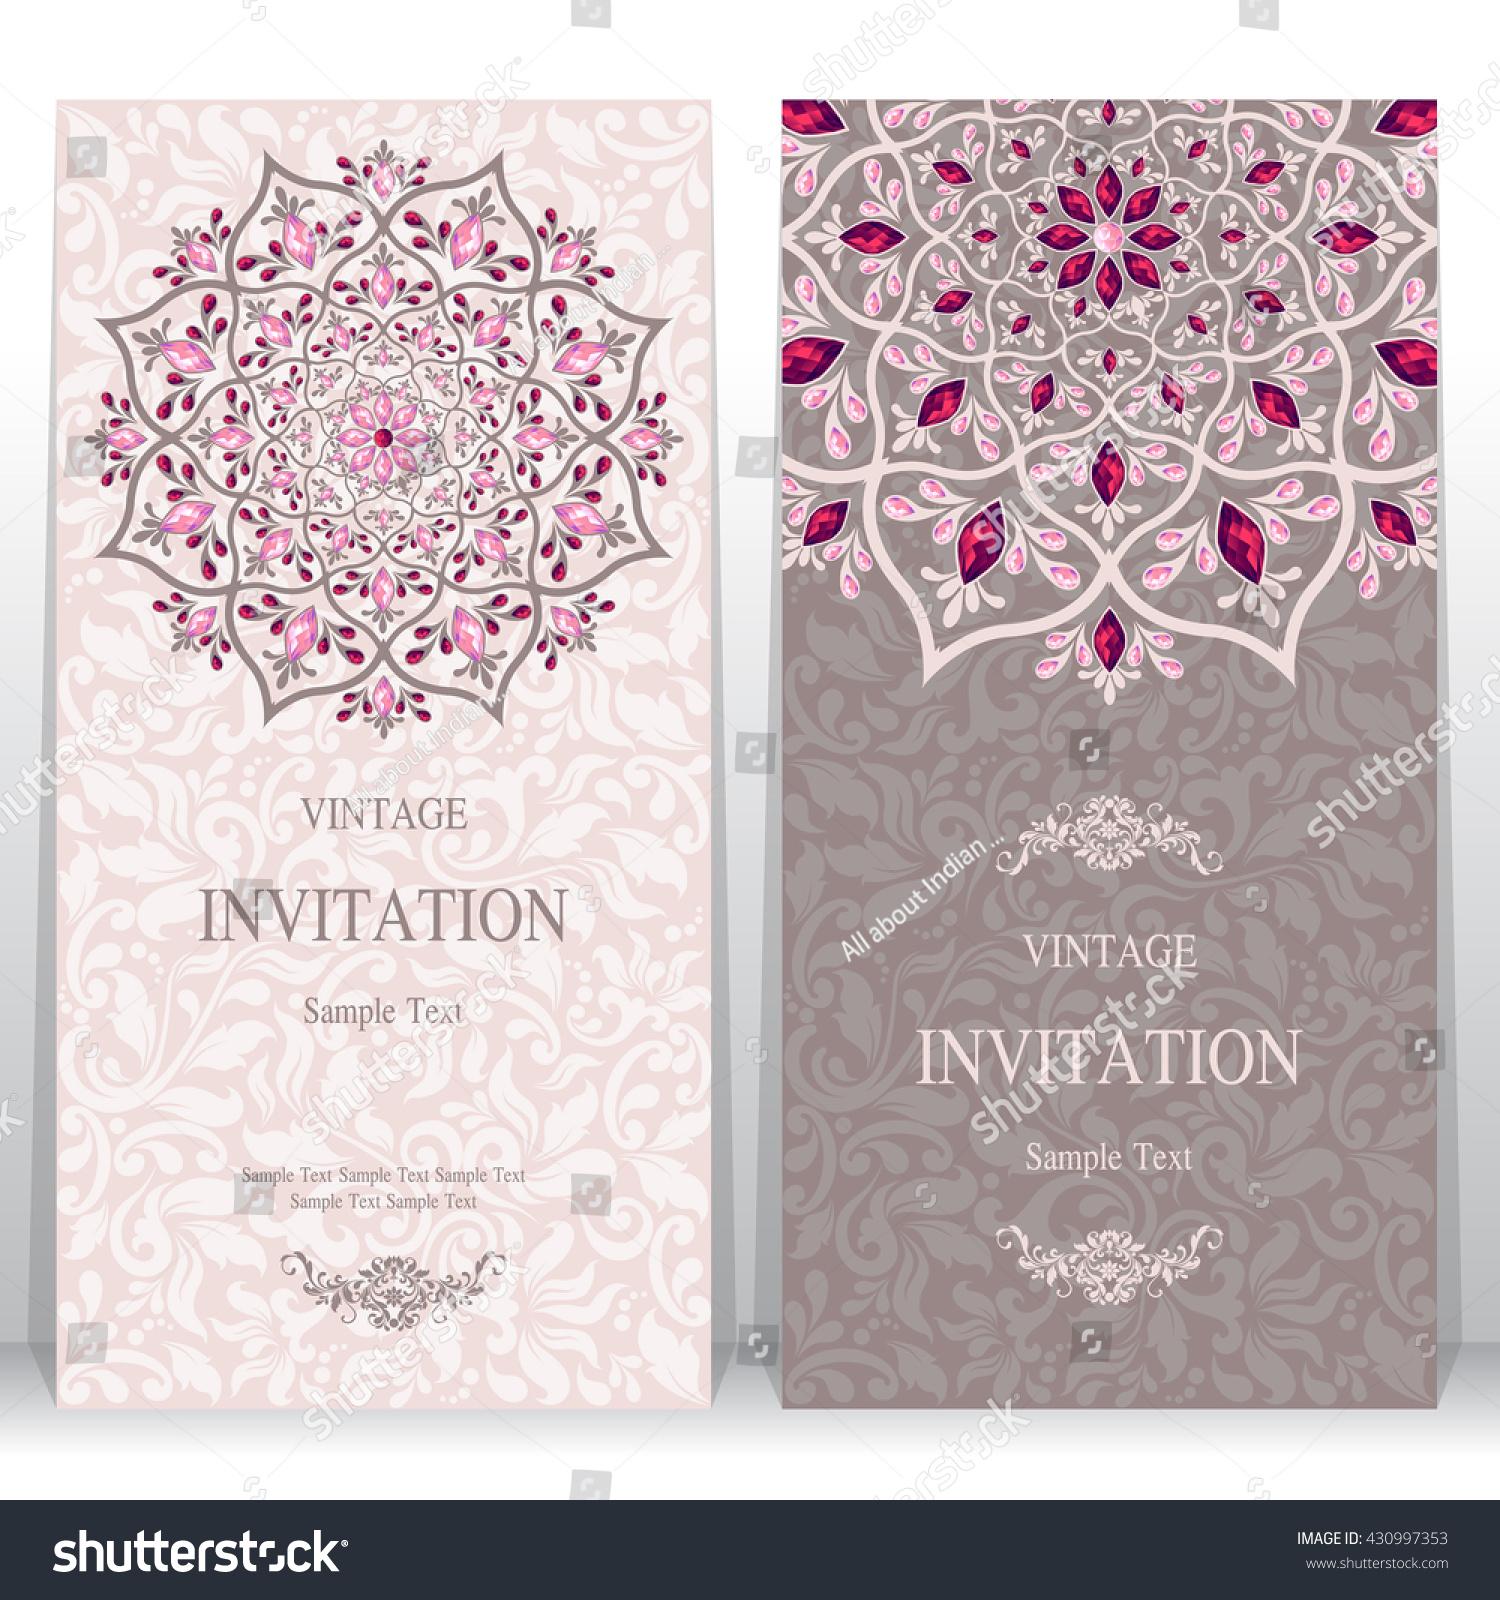 Wedding Card Invitation Card Card Abstract Stock Vector 430997353 ...